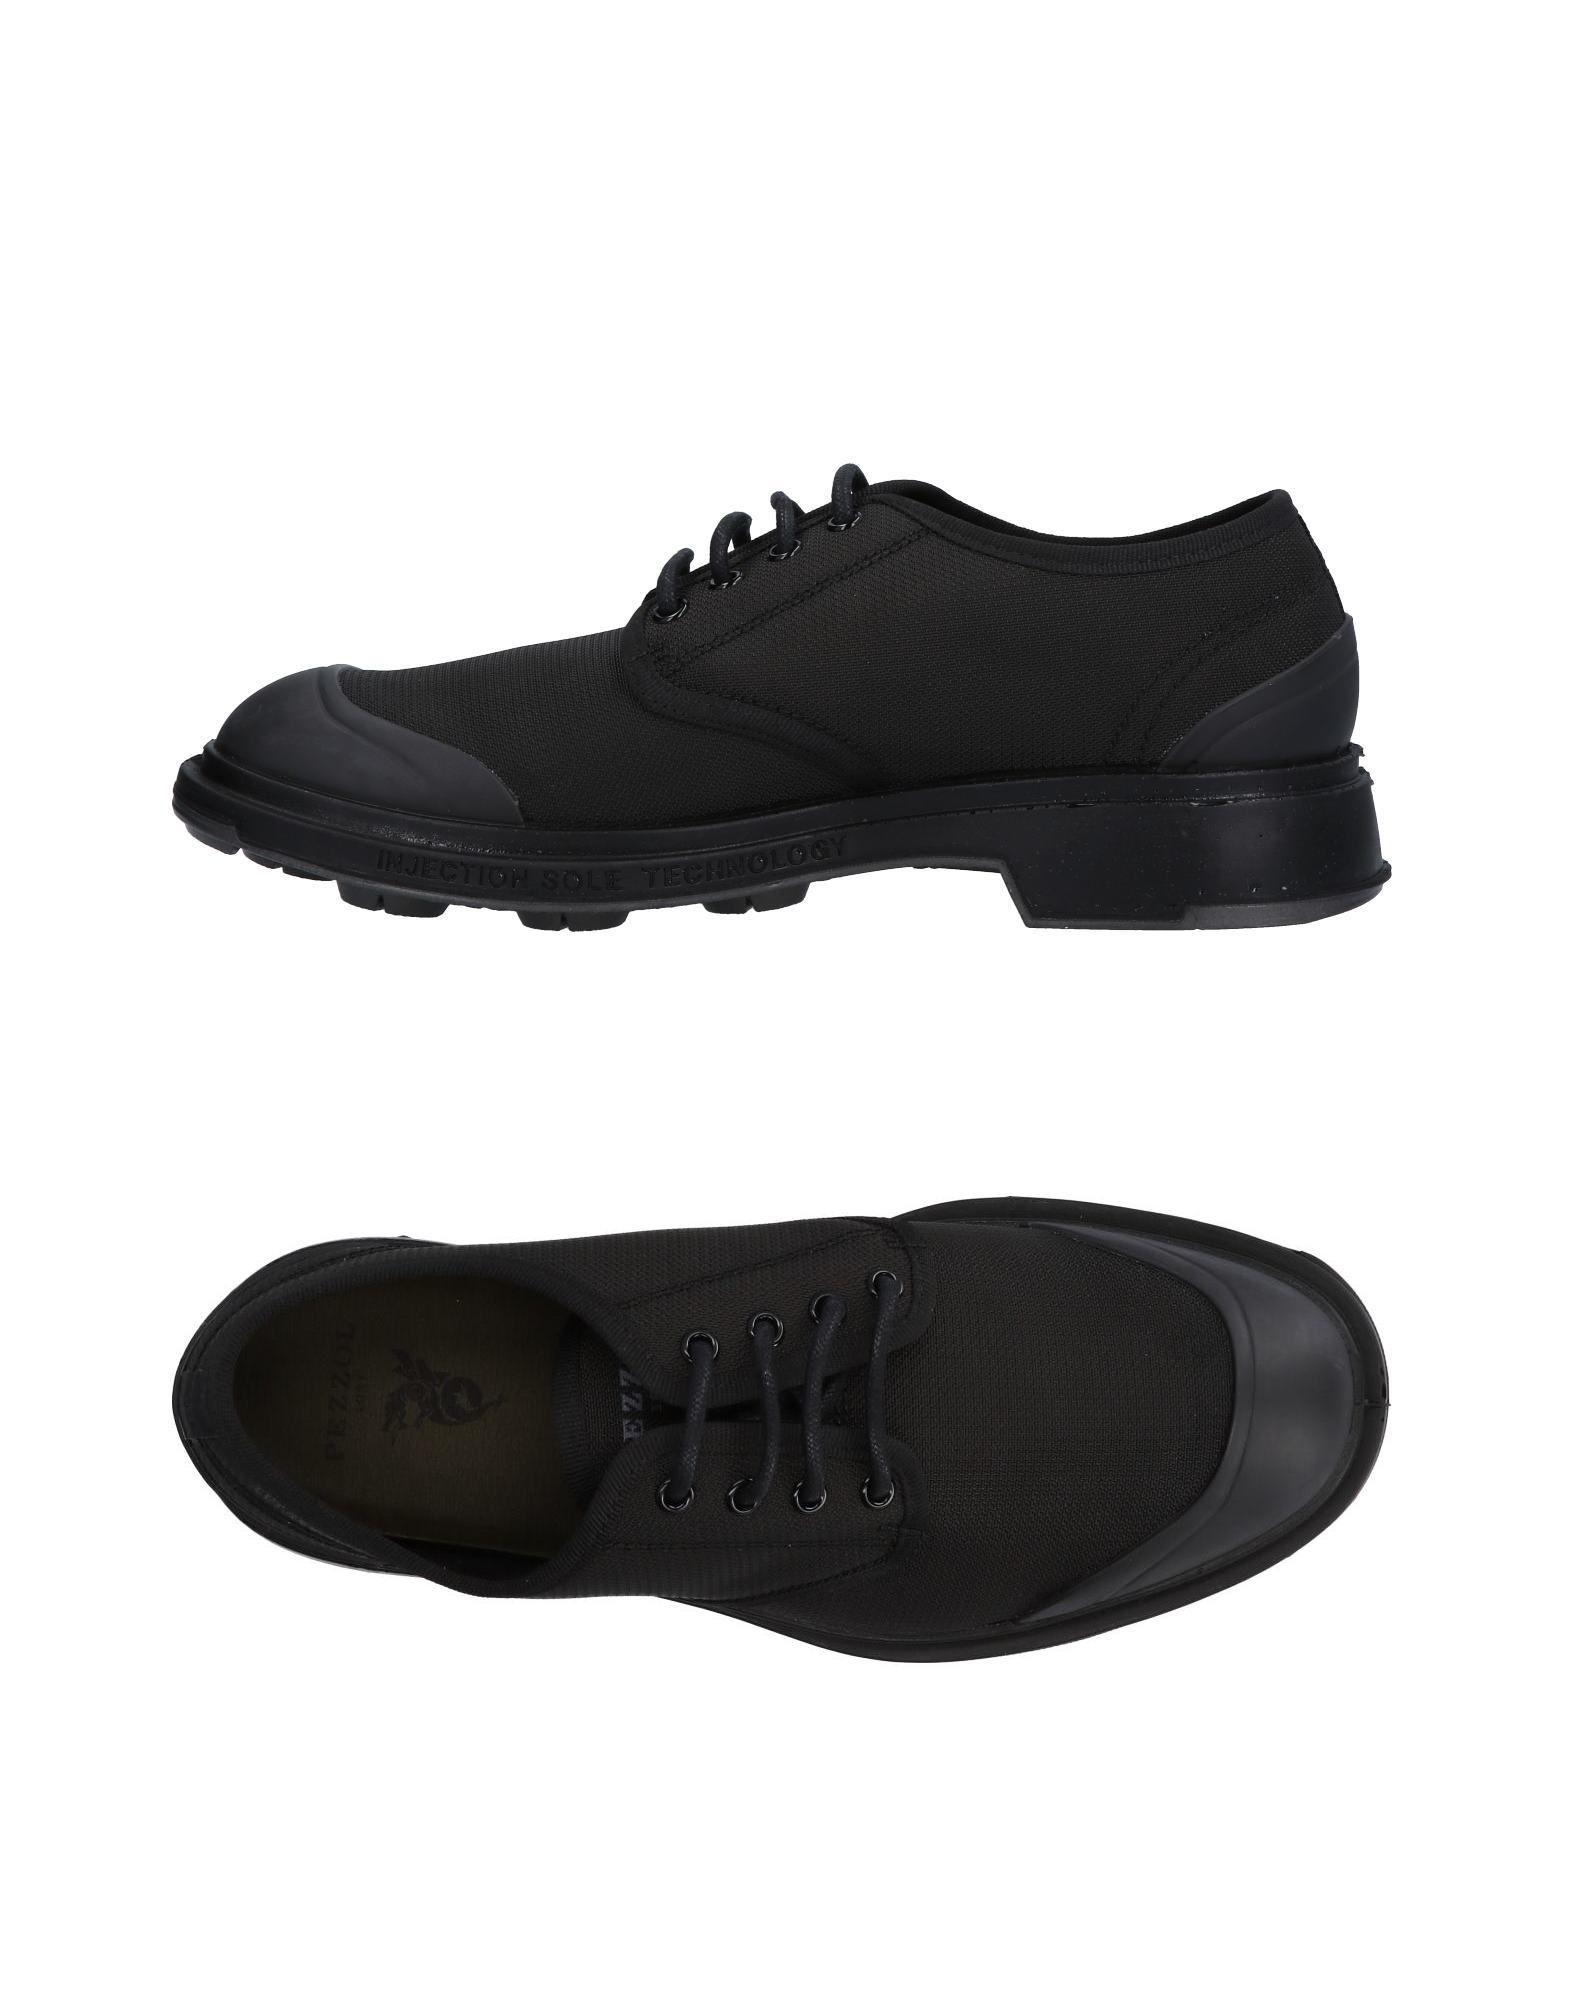 best service b52f4 34181 Pezzol 1951 Sneakers - Men Pezzol 1951 Sneakers online on YOOX United  Kingdom - 11484379AH